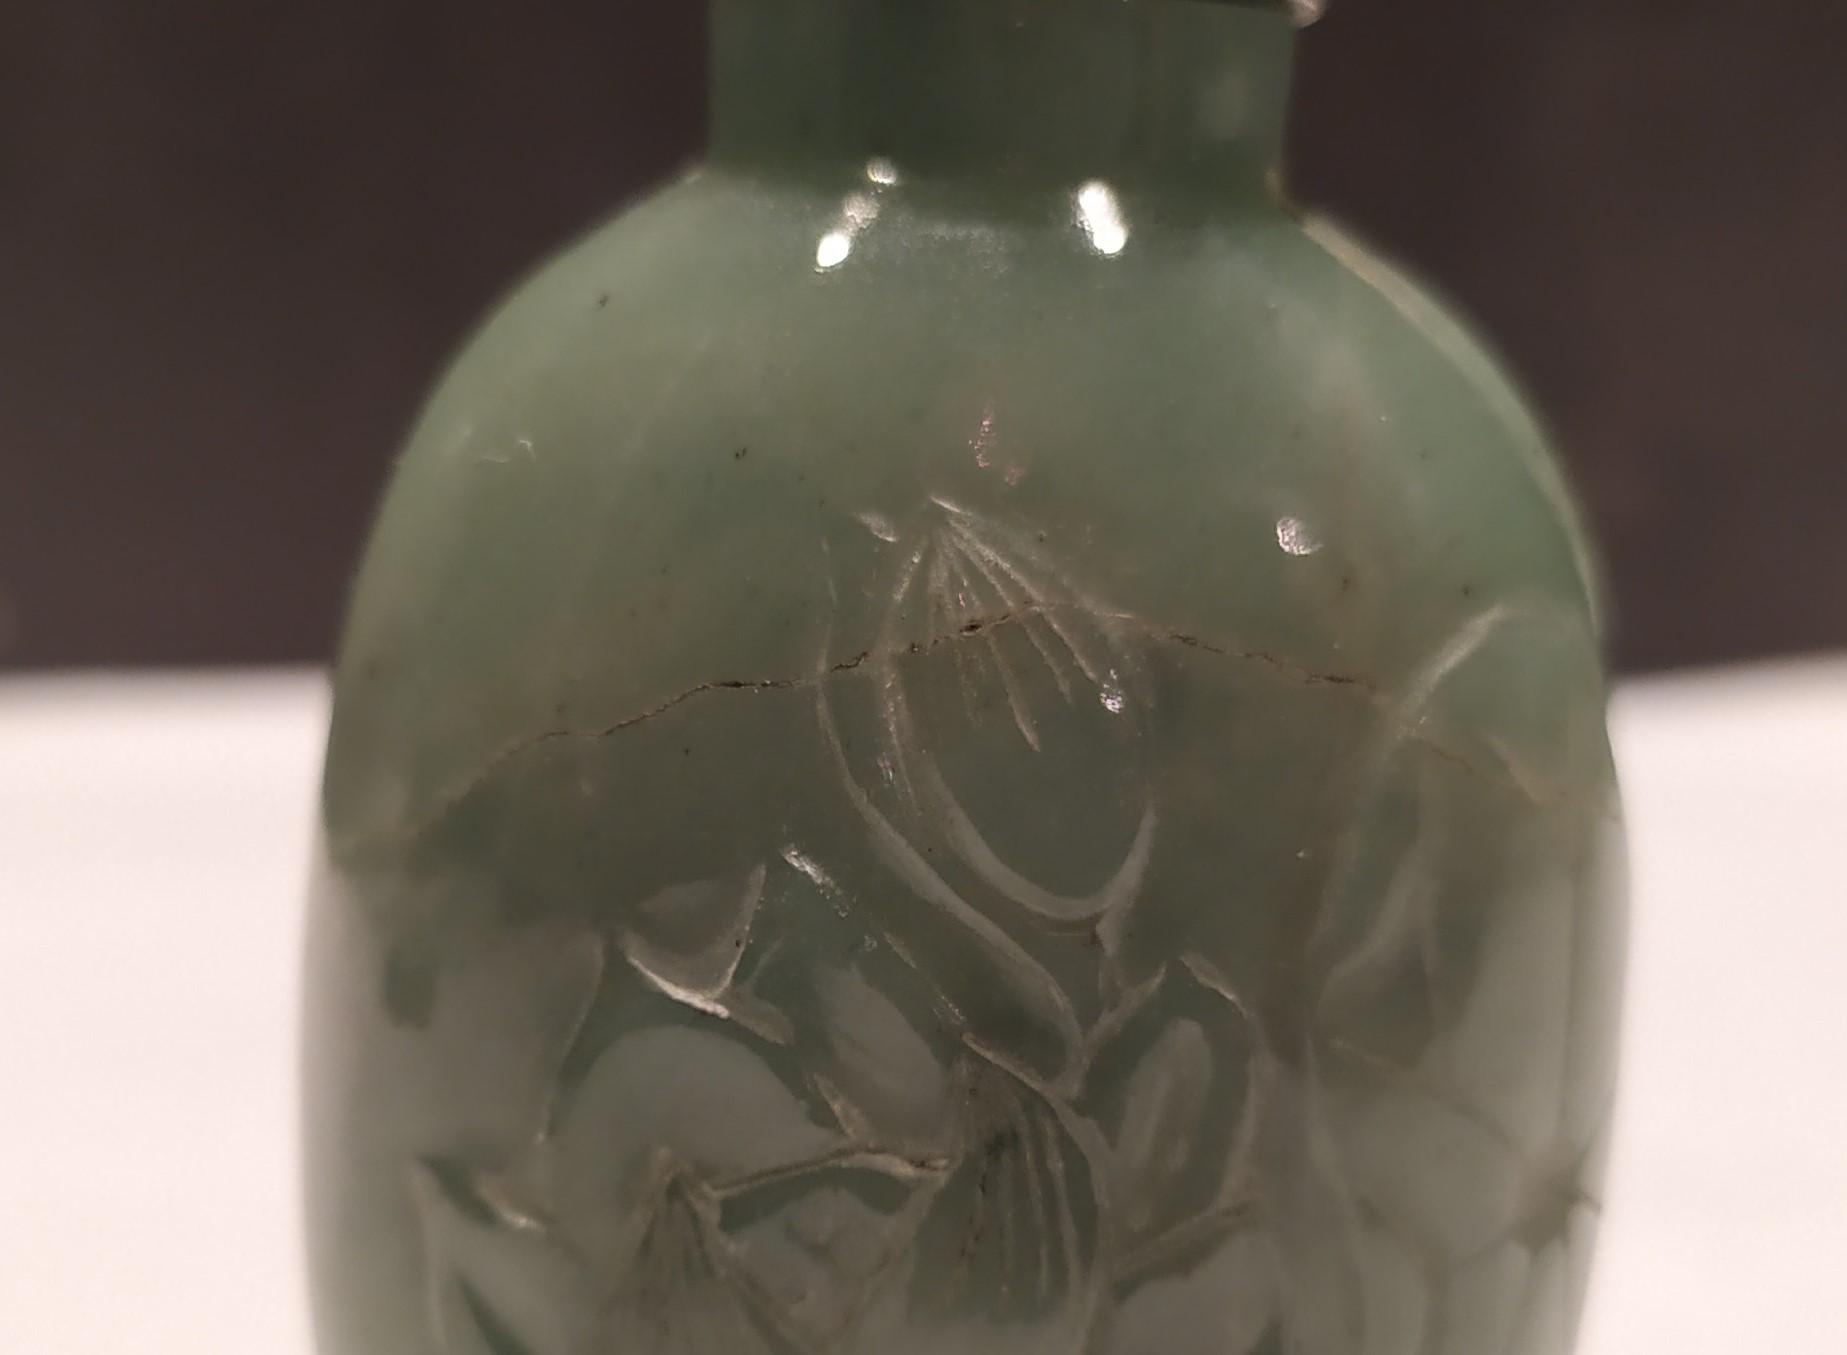 thumb8|Snuff bottle, porta tabacco fiuto, giada verde motivi floreali, Cina XX secolo